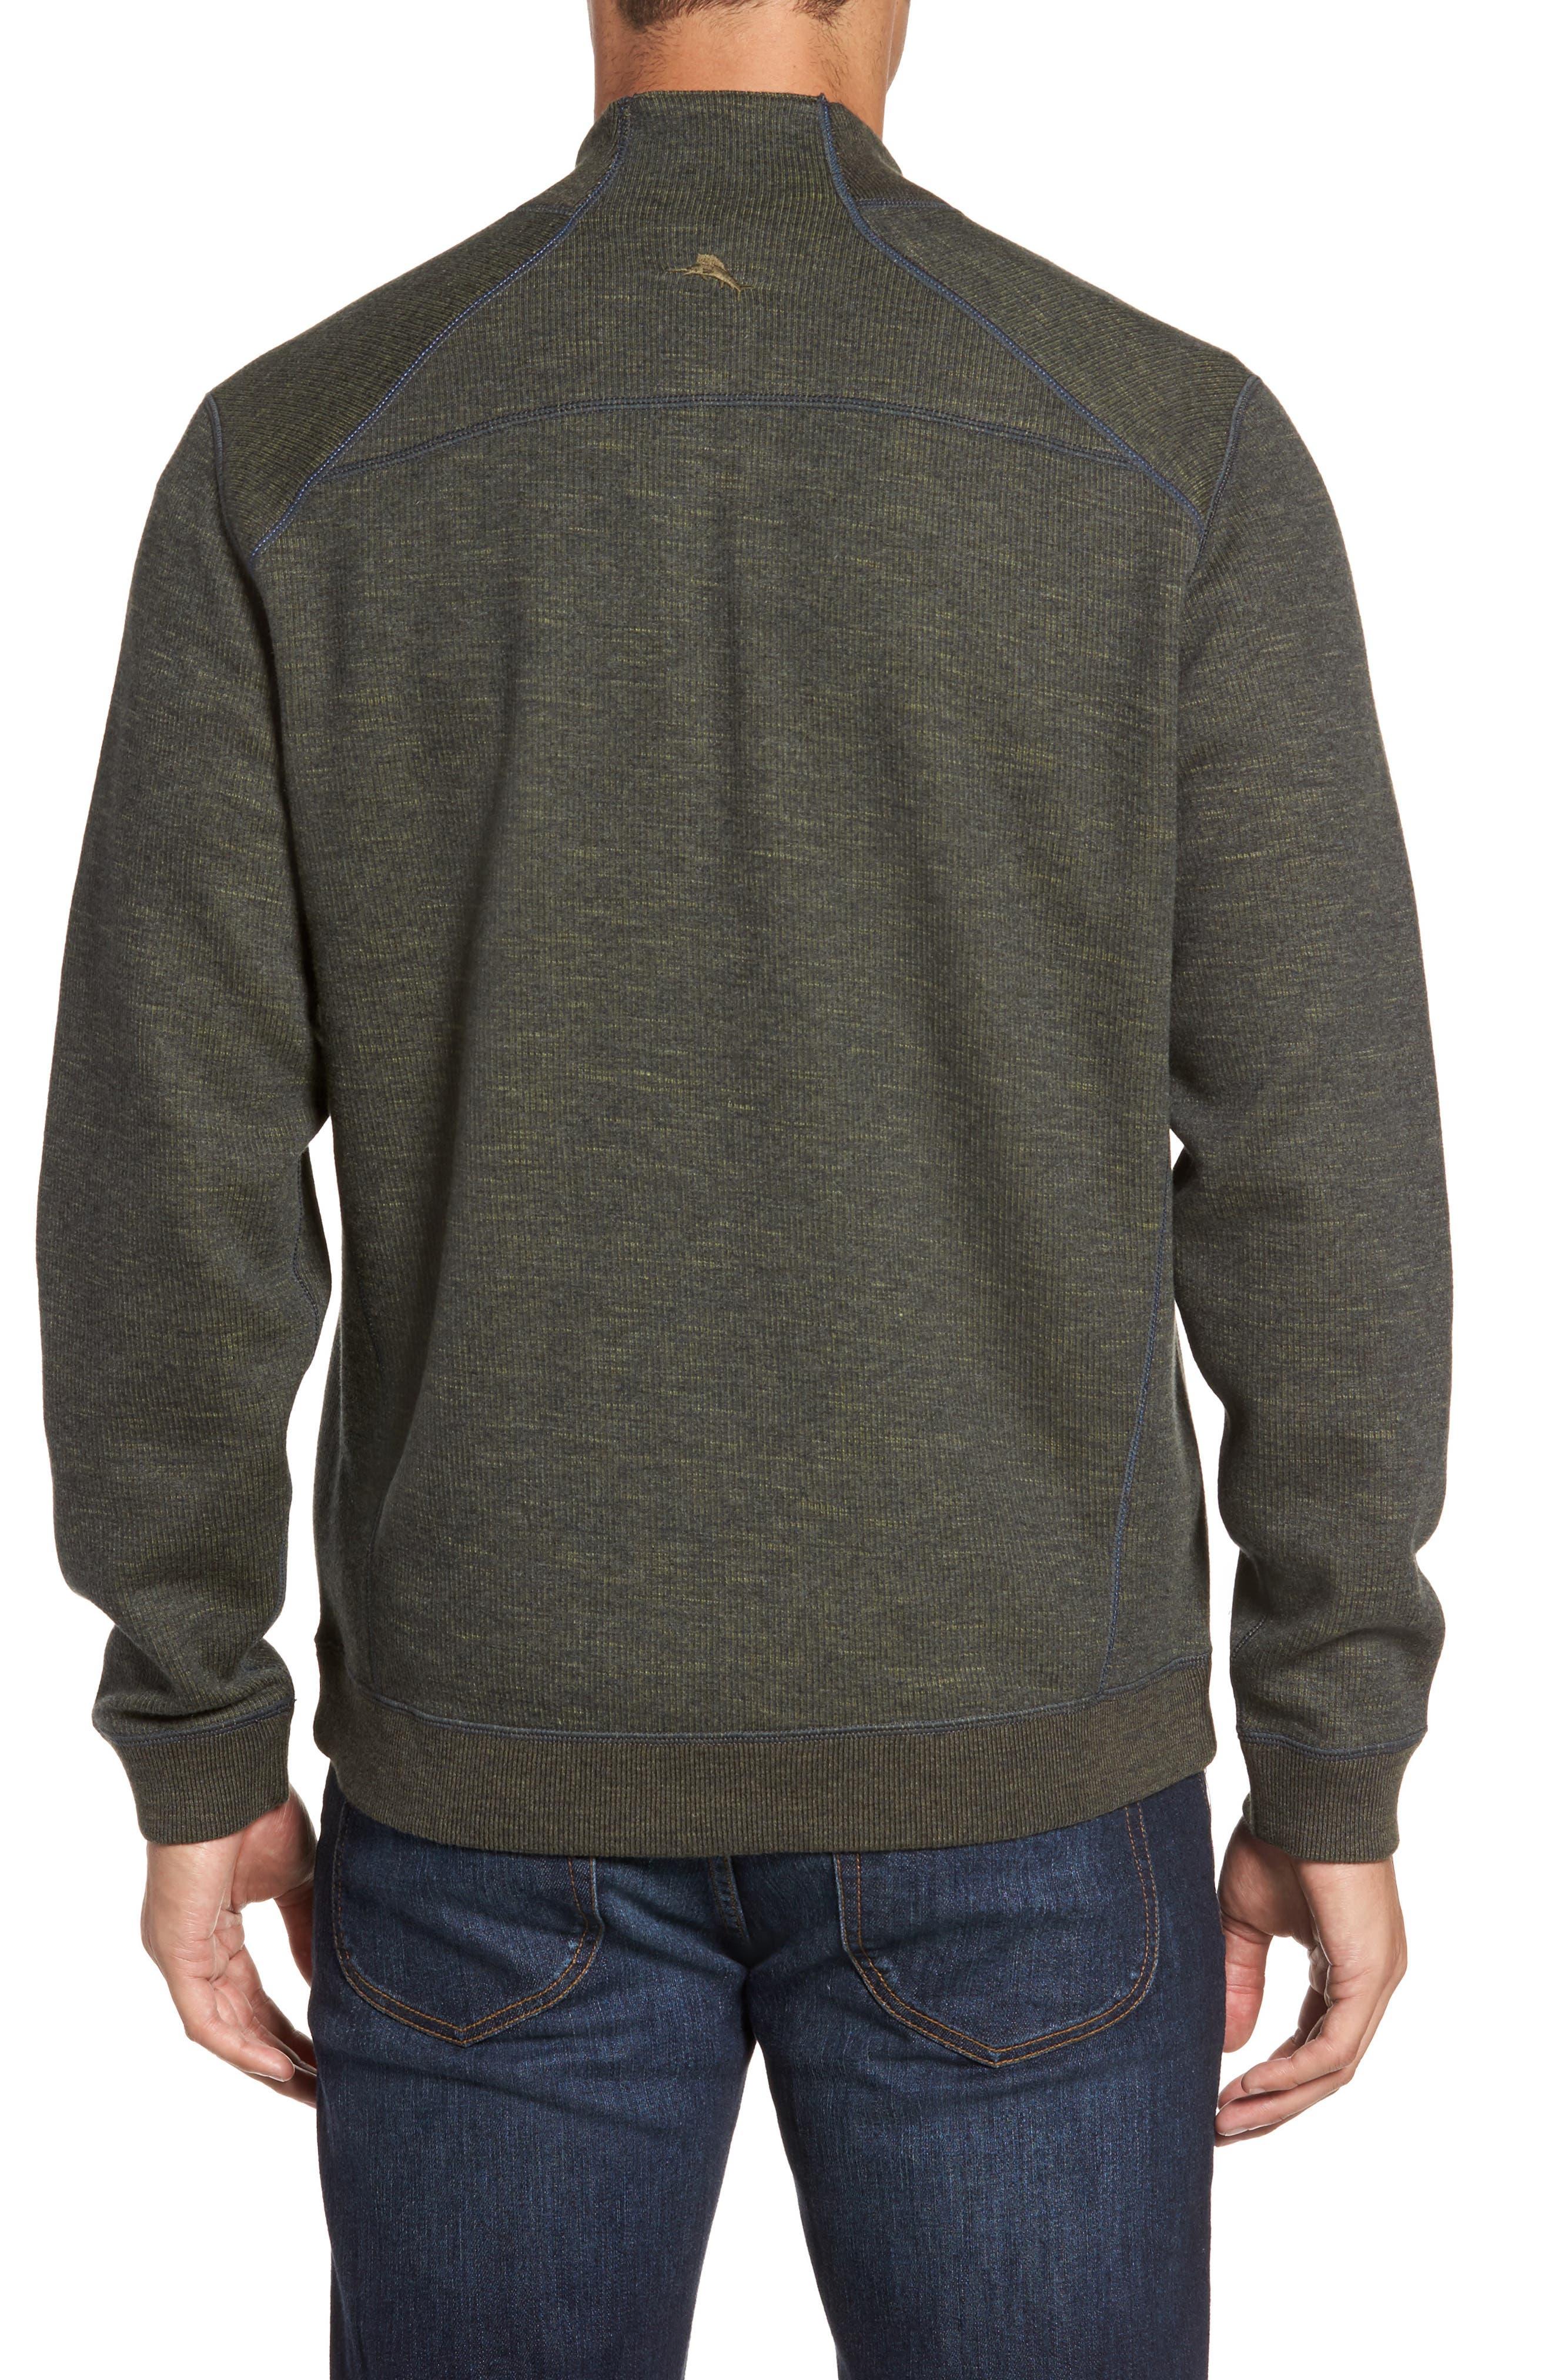 Flipsider Reversible Quarter-Zip Pullover,                             Alternate thumbnail 3, color,                             Steel Wool Heather